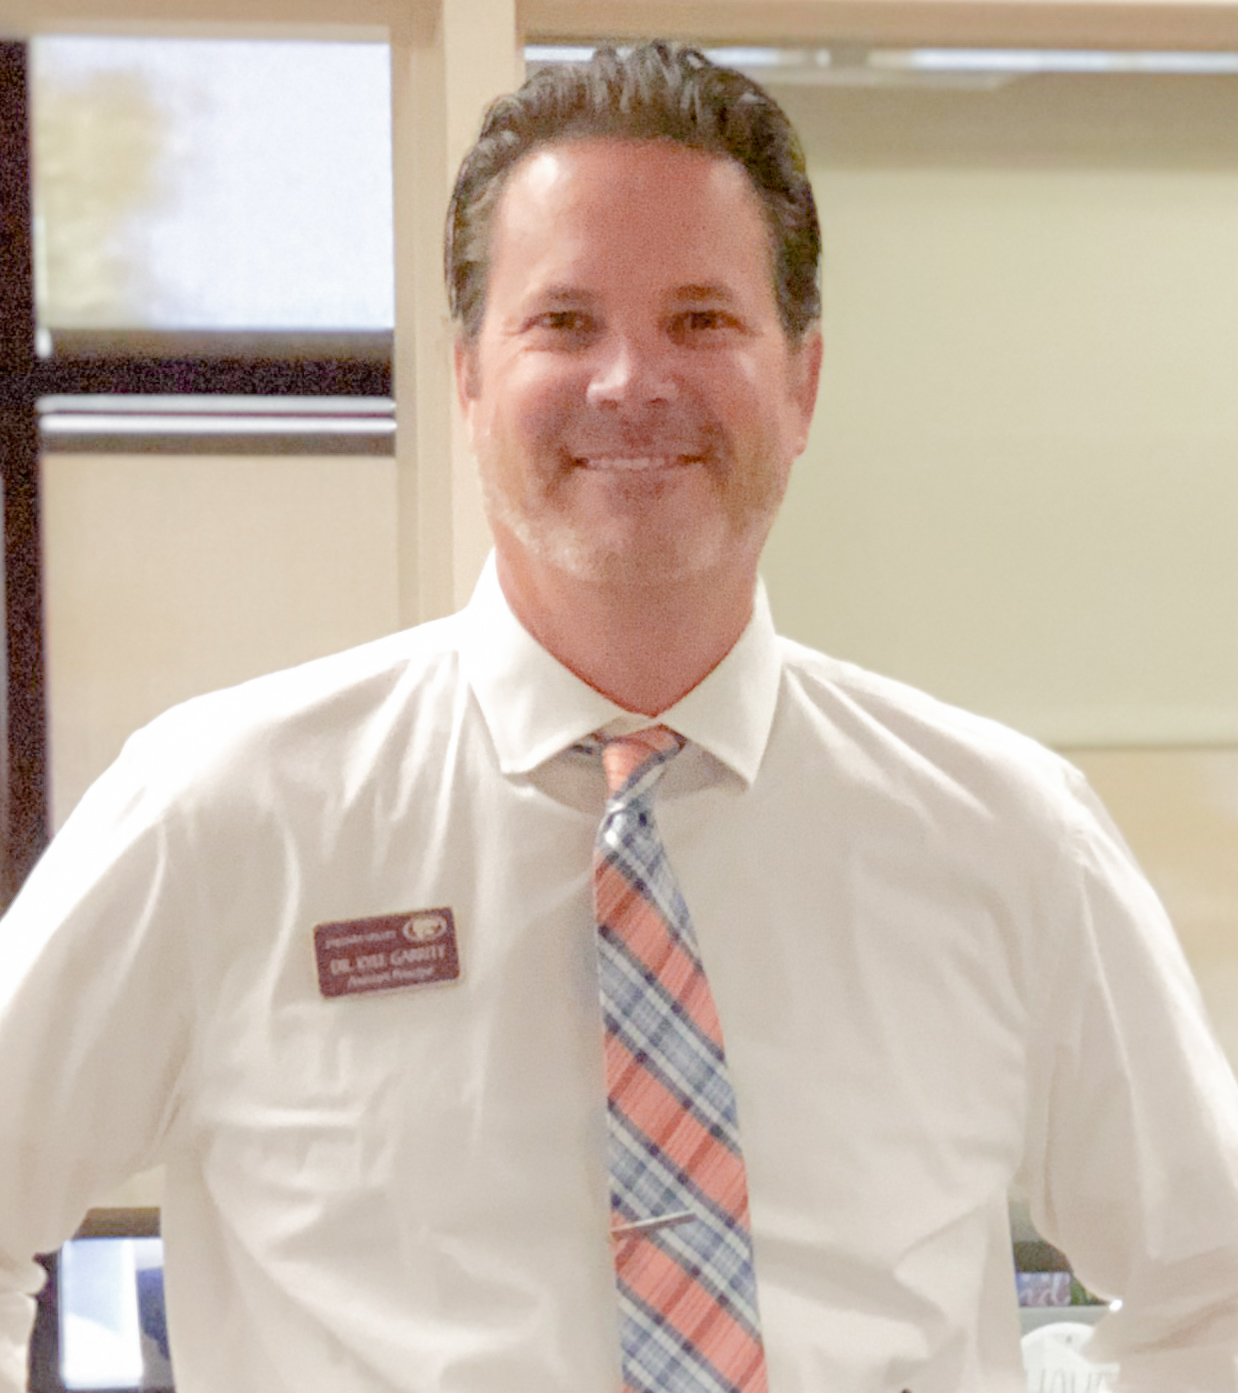 image of Assistant Principal Garrity